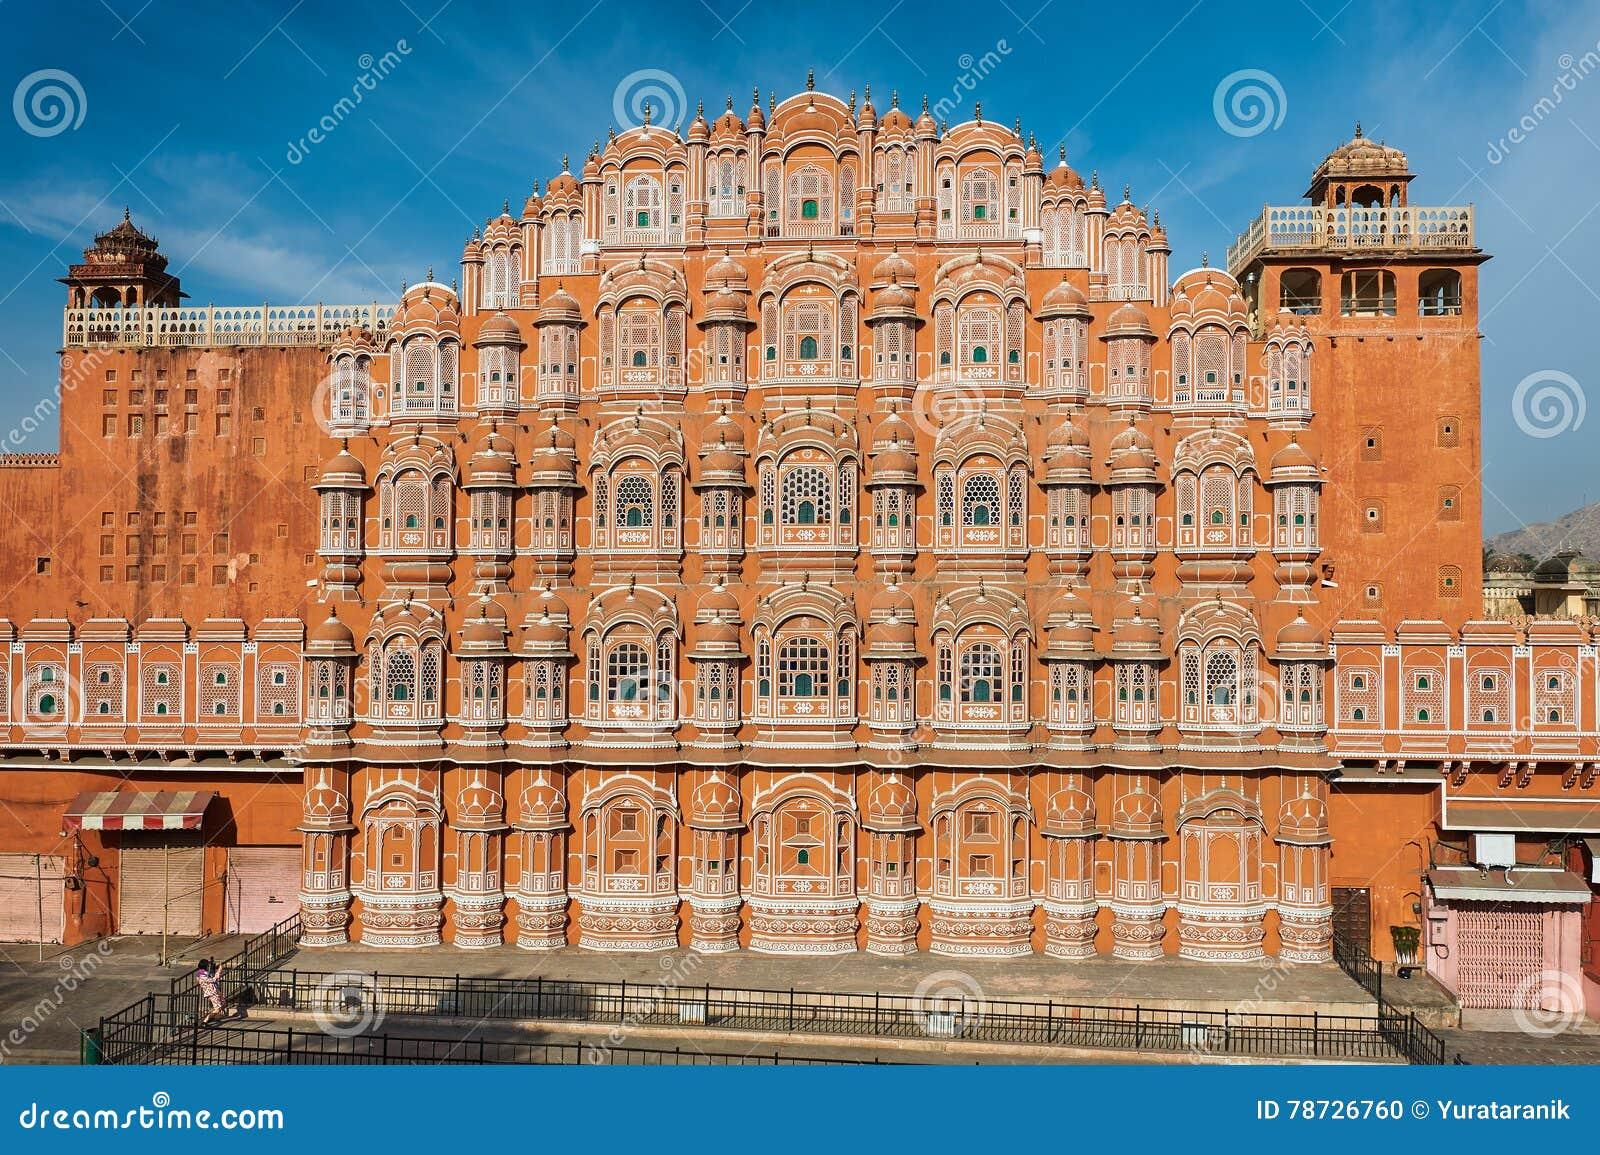 15 Architetti Famosi hawa mahal, il palazzo dei venti, jaipur, ragiastan, india